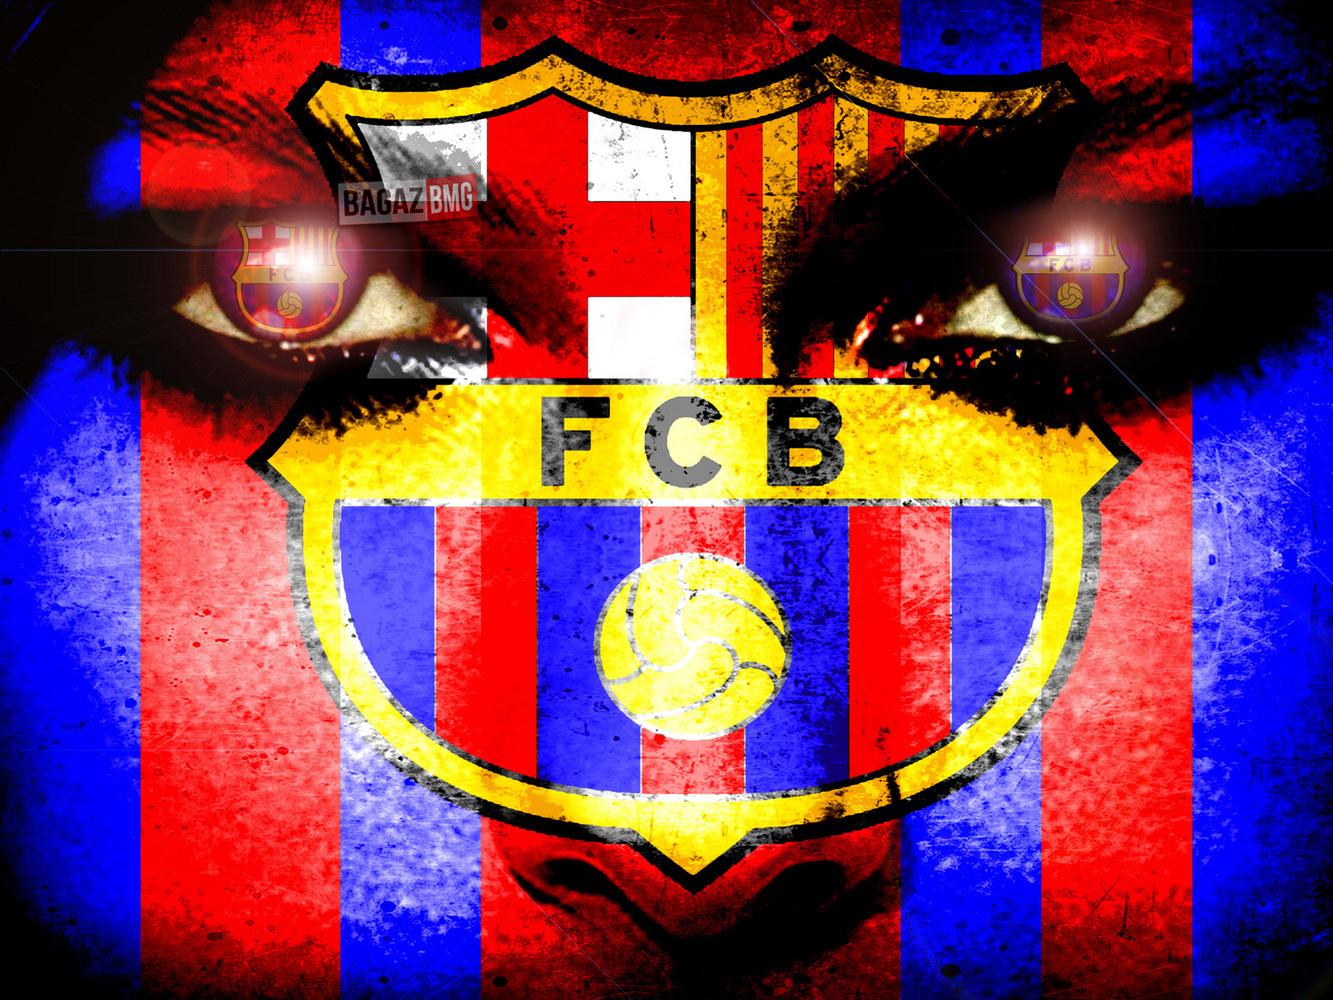 49 ] Barca Fans Wallpaper On WallpaperSafari